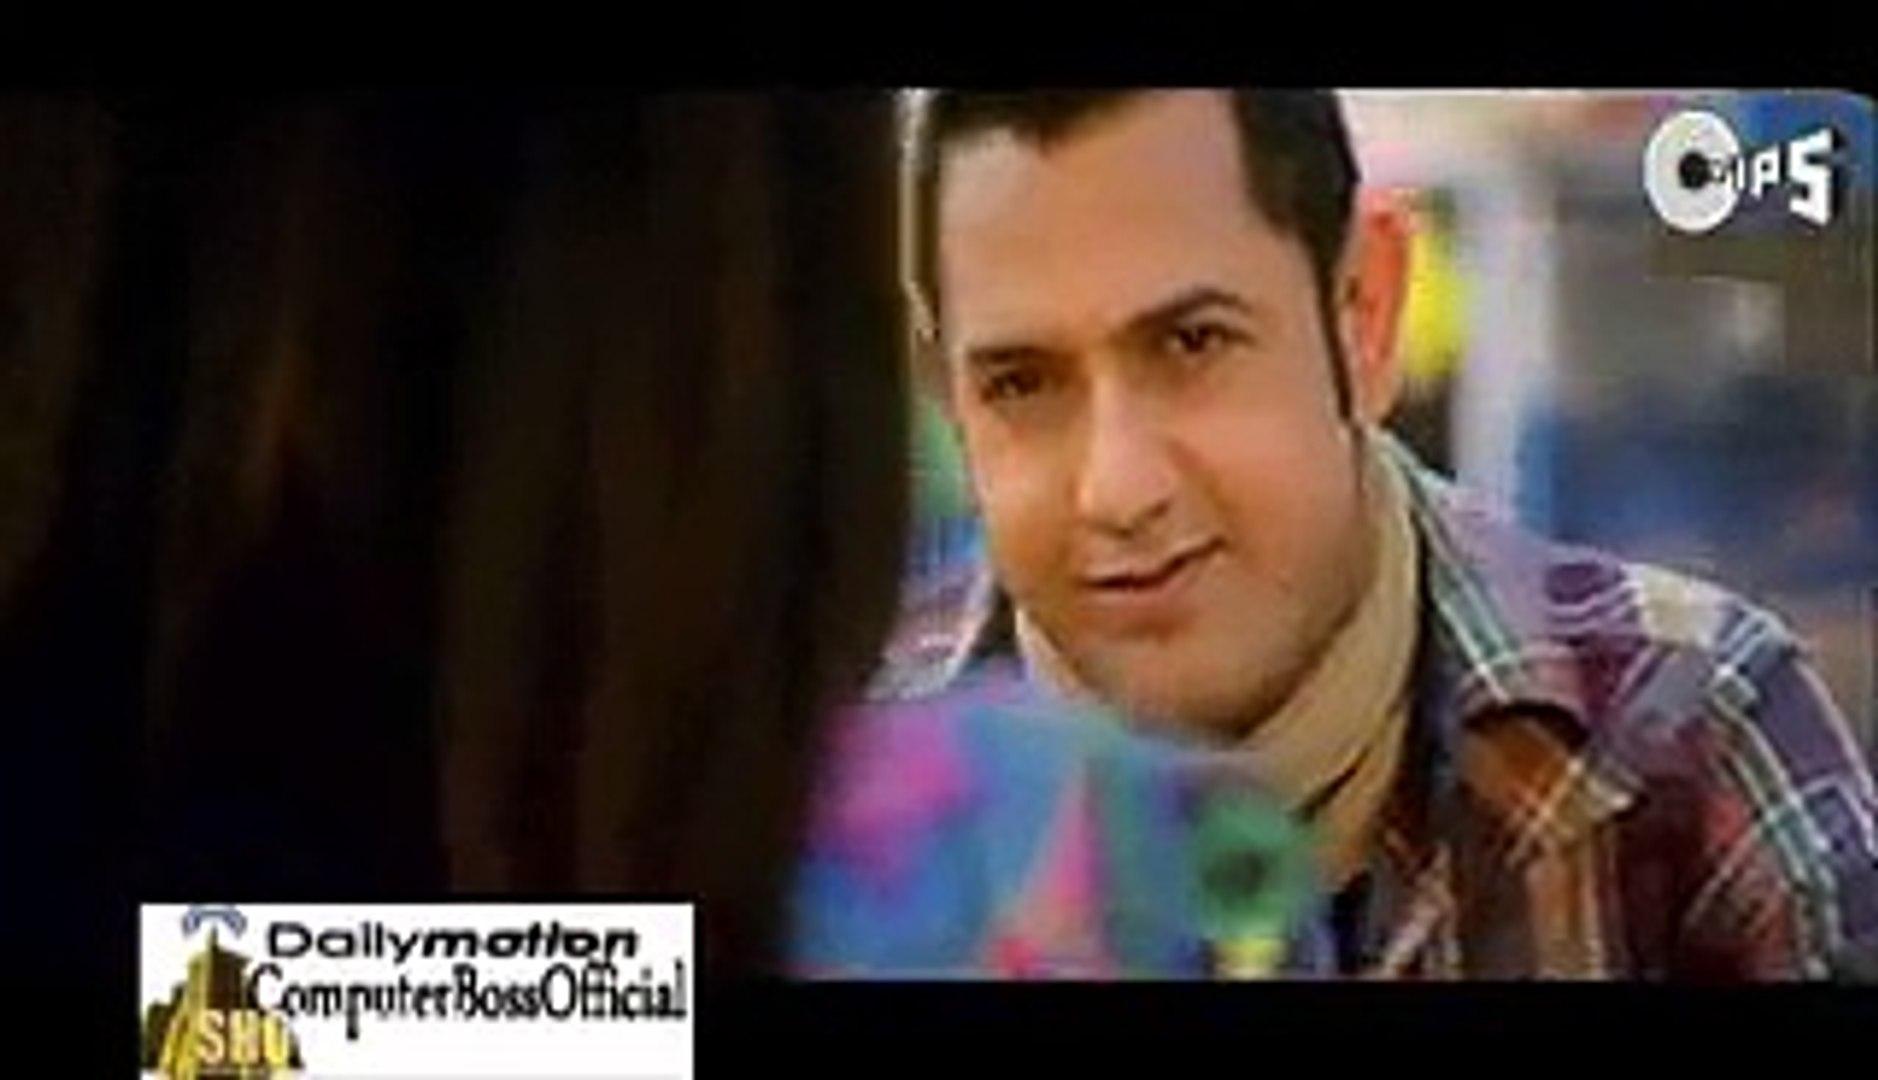 Billi Billi Akh Waliye Pawara Teri Akh Da By Gippy Grewal Indian Panjabi Songs-Giya Giya Hun Dil Giy